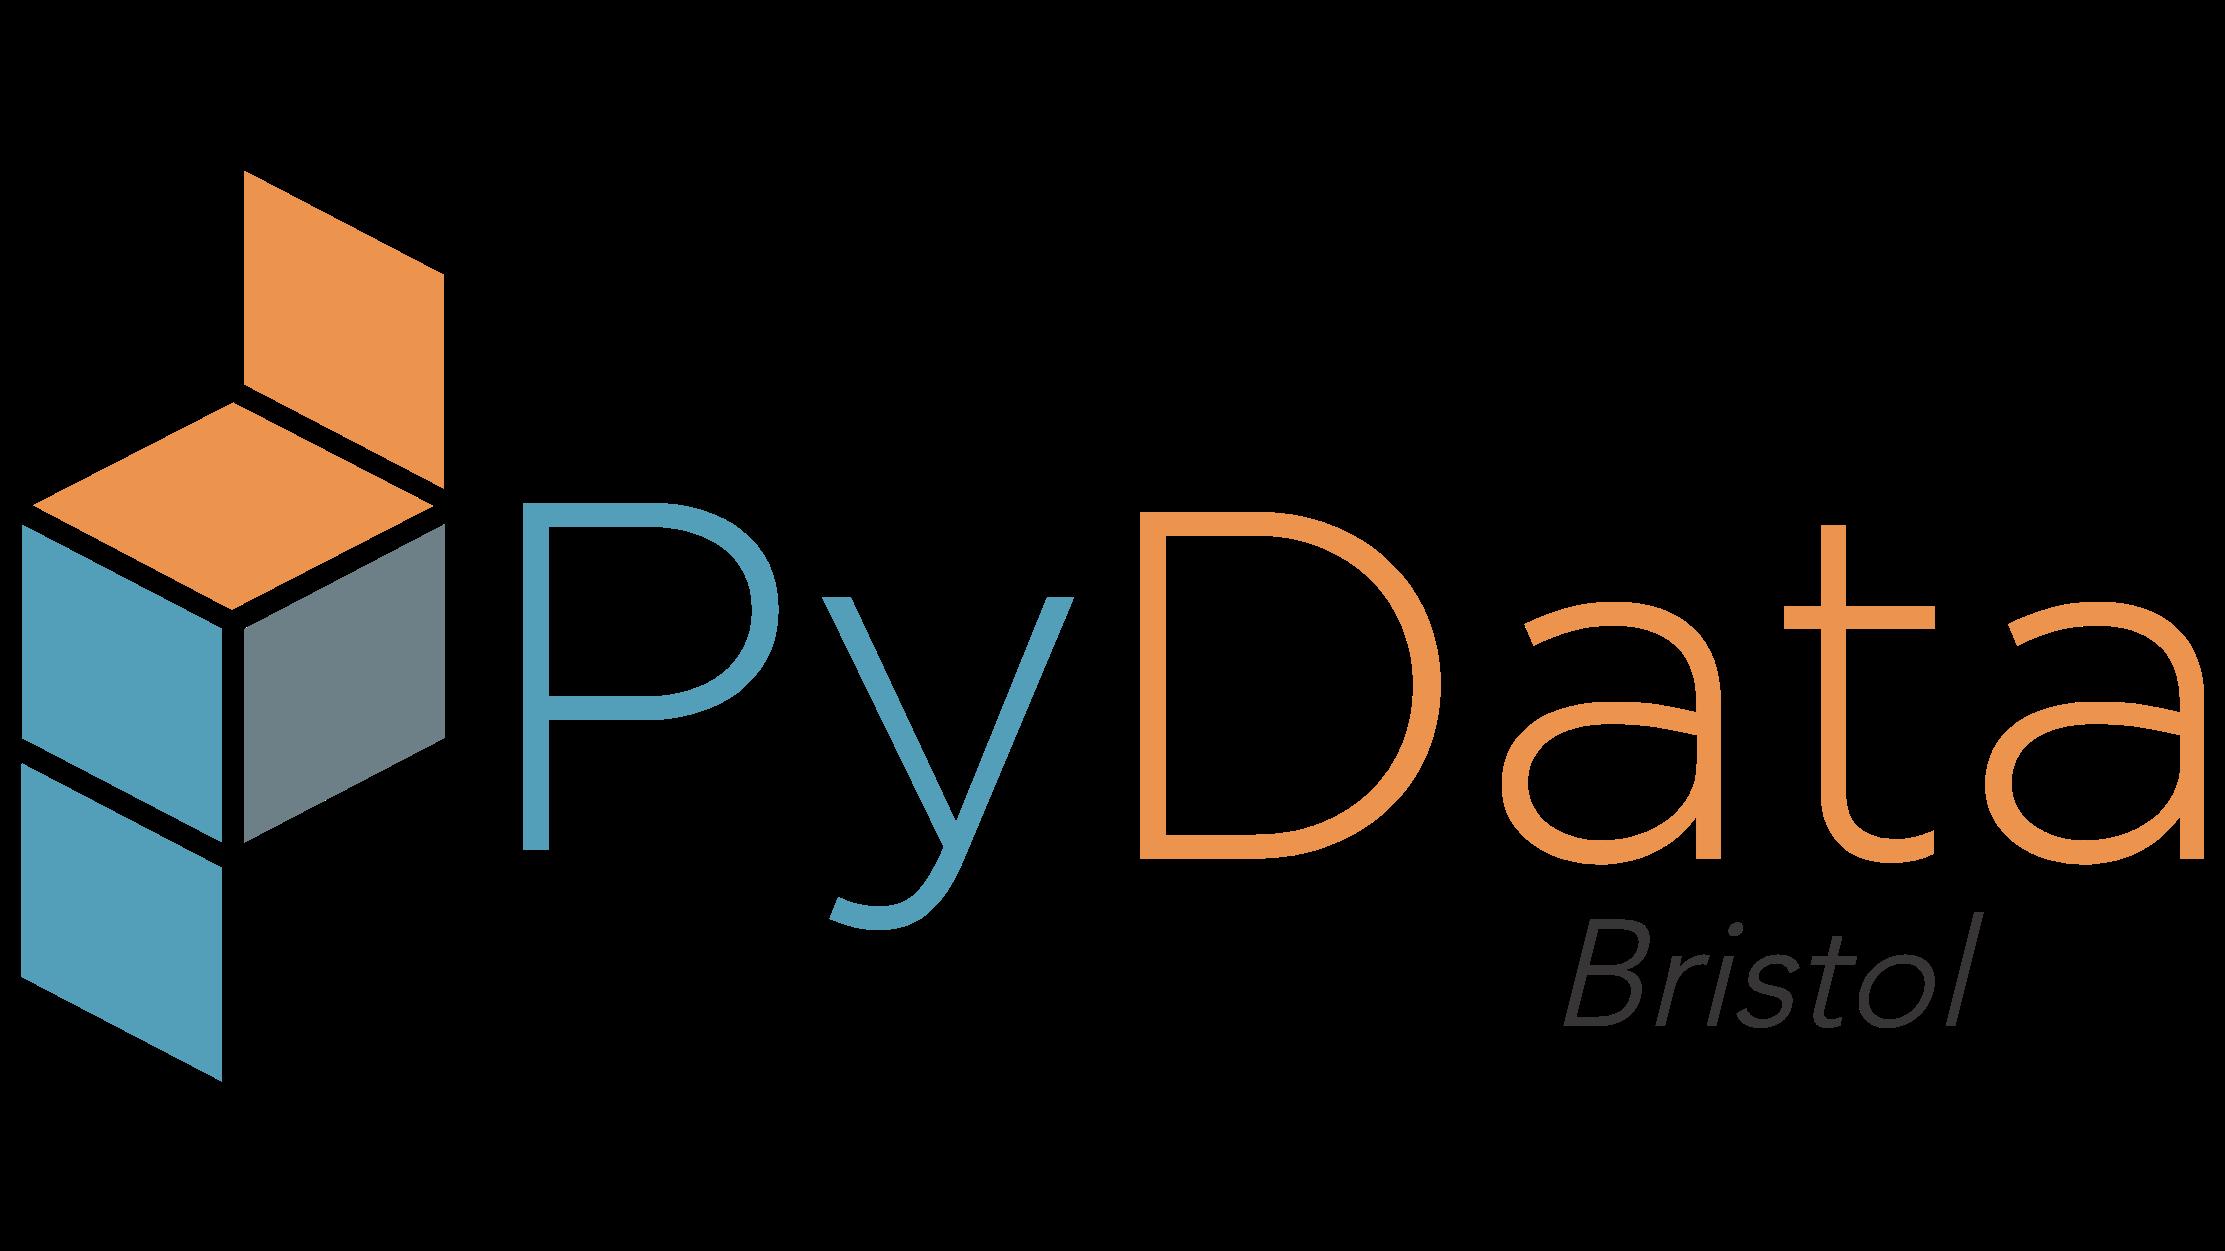 PyData Bristol